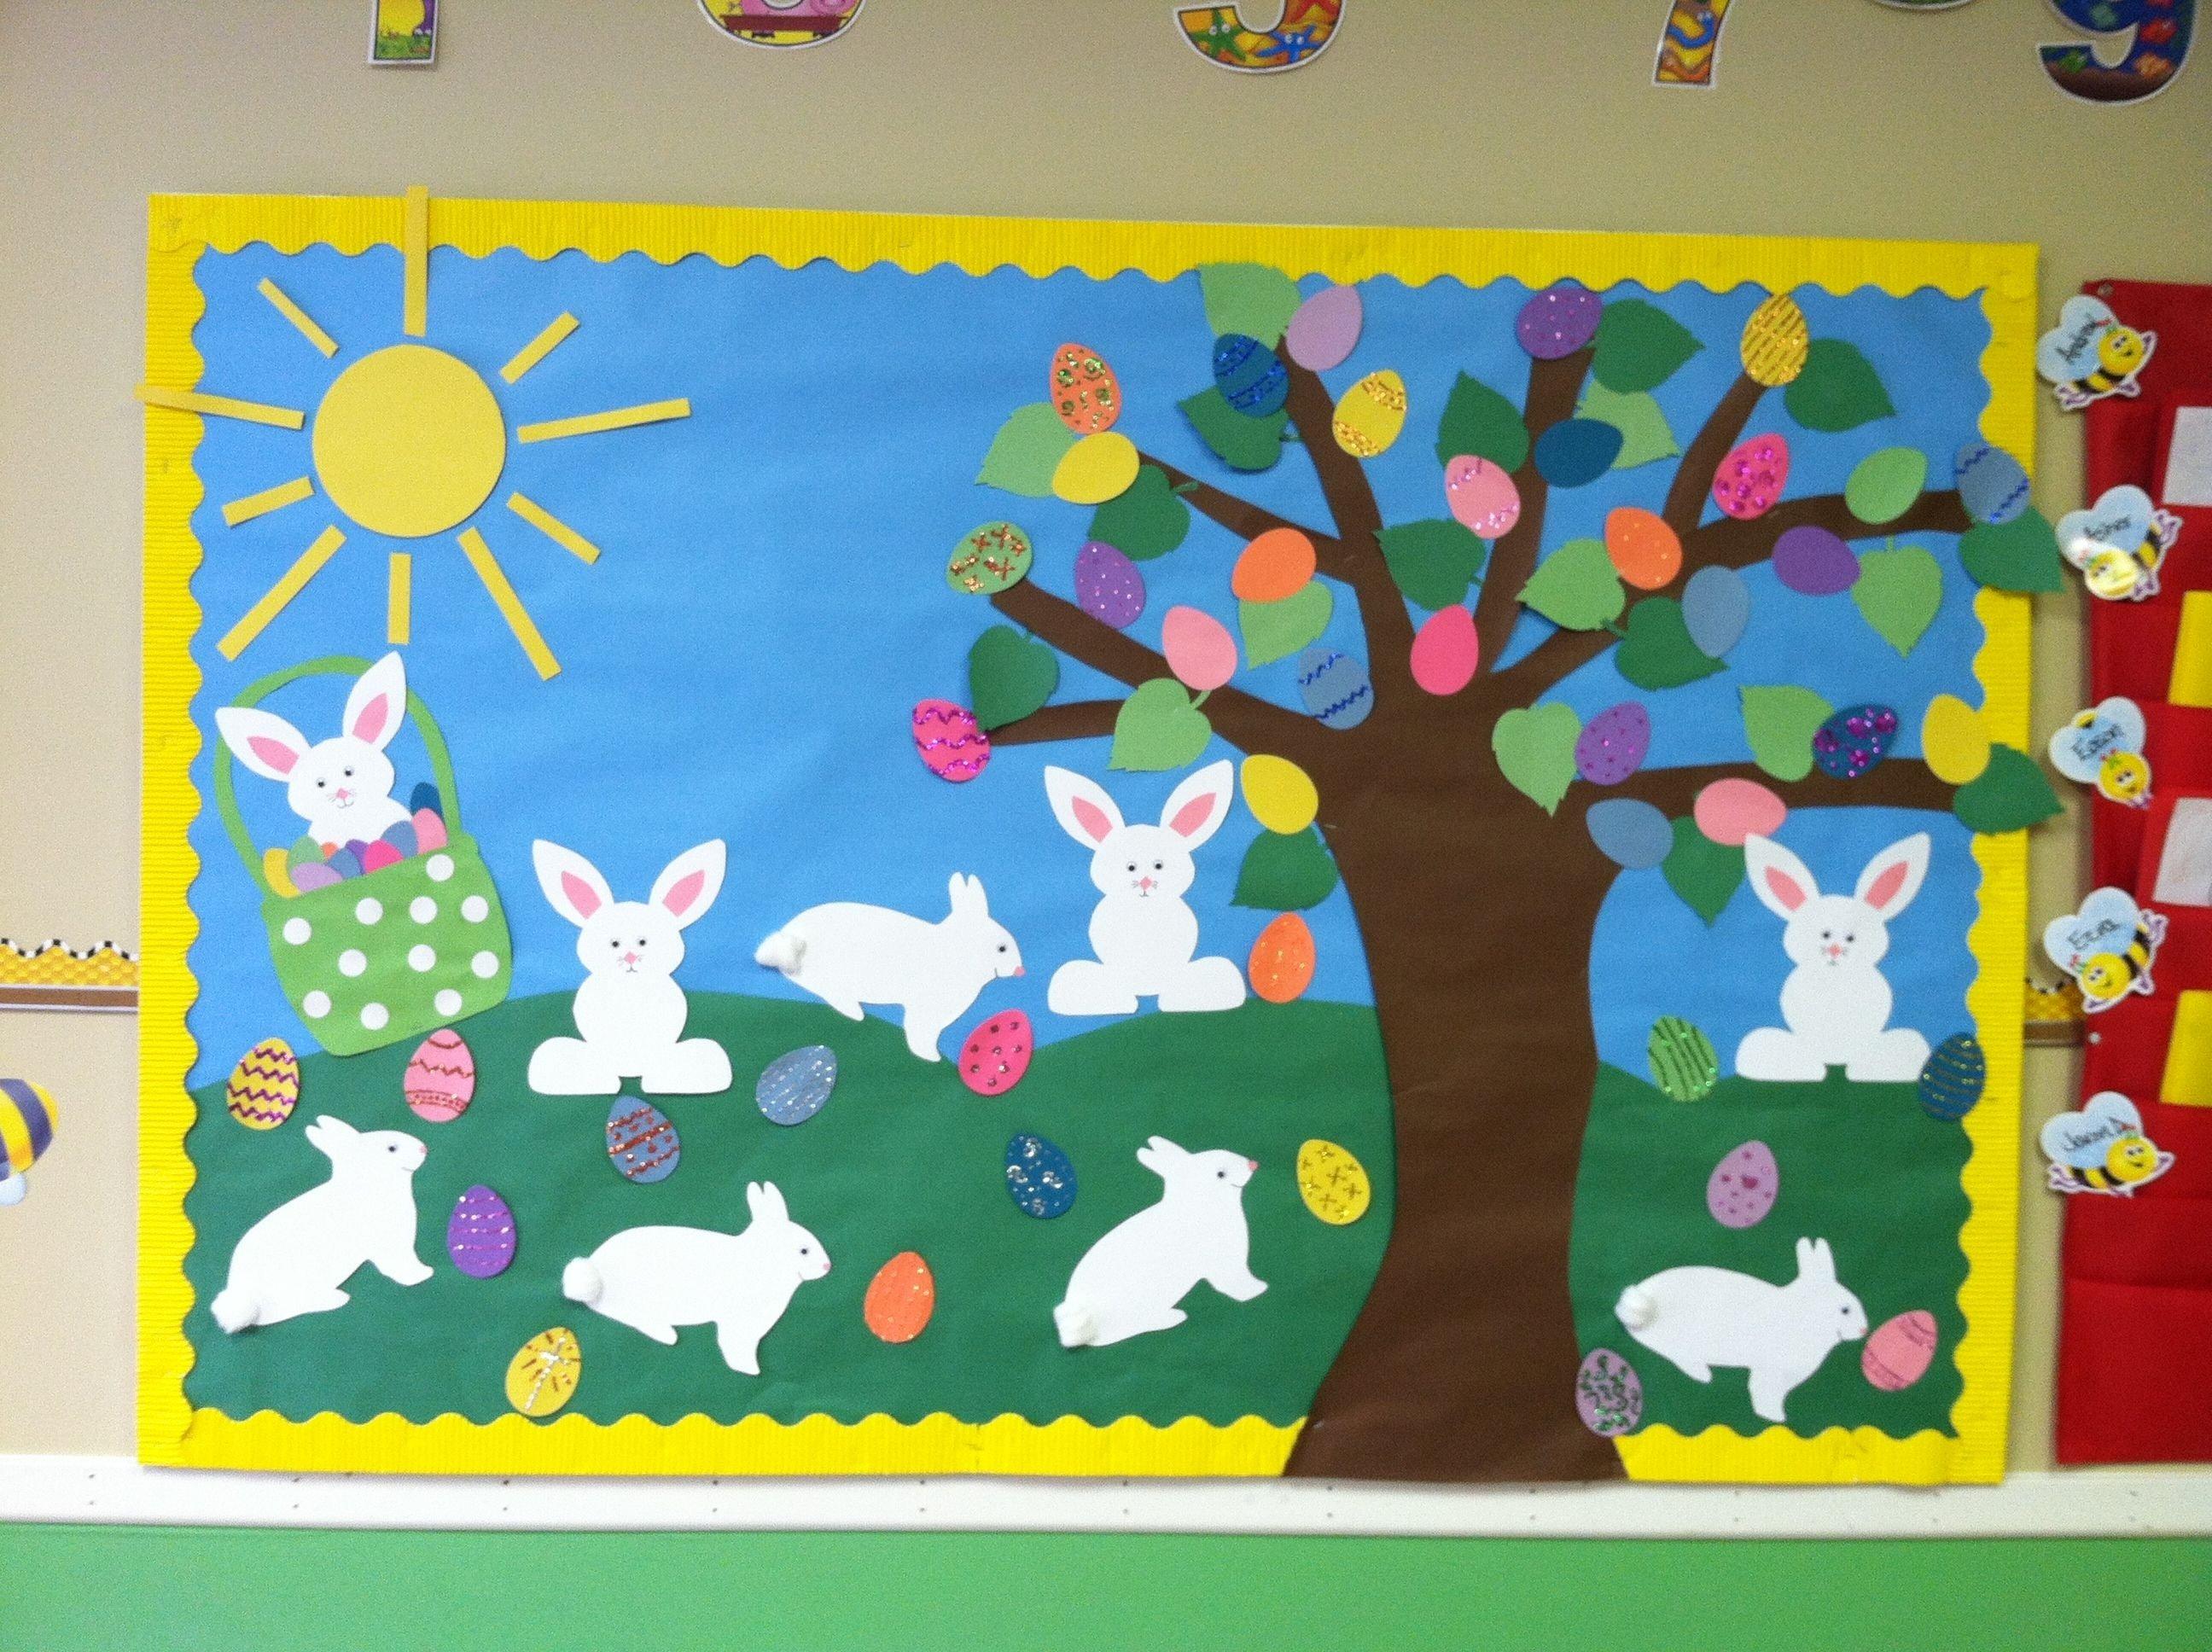 10 Trendy Spring Preschool Bulletin Board Ideas 10 easter bulletin board ideas bulletin board board and spring 2020